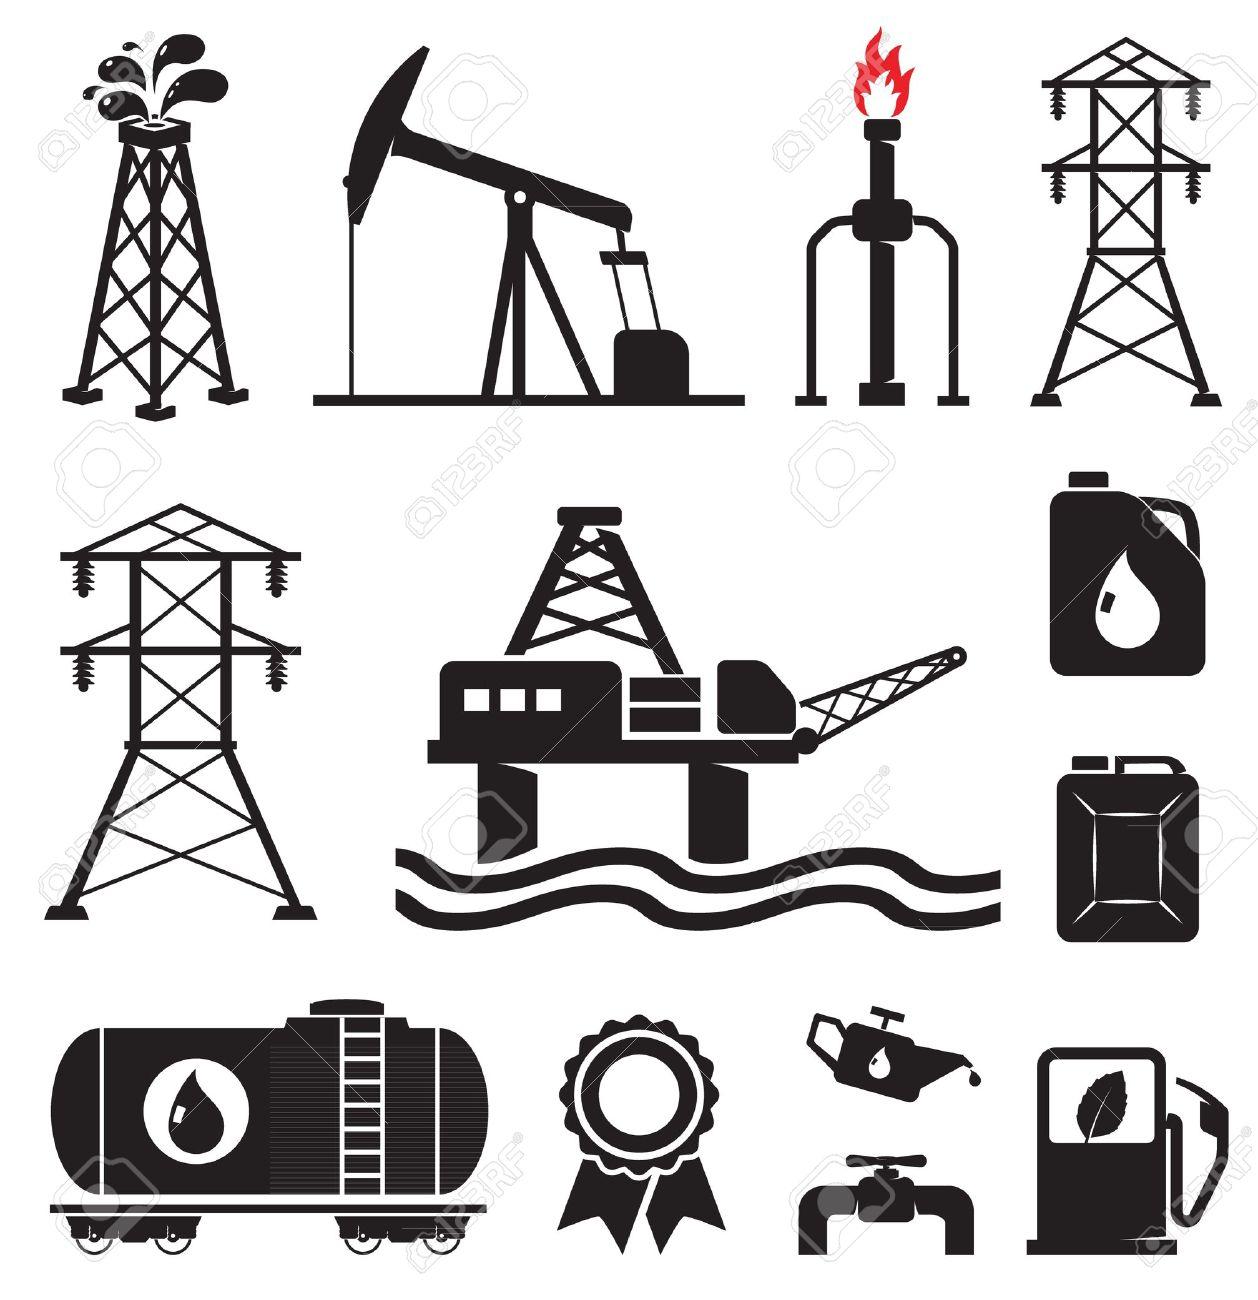 Oil, gas, electricity symbols.